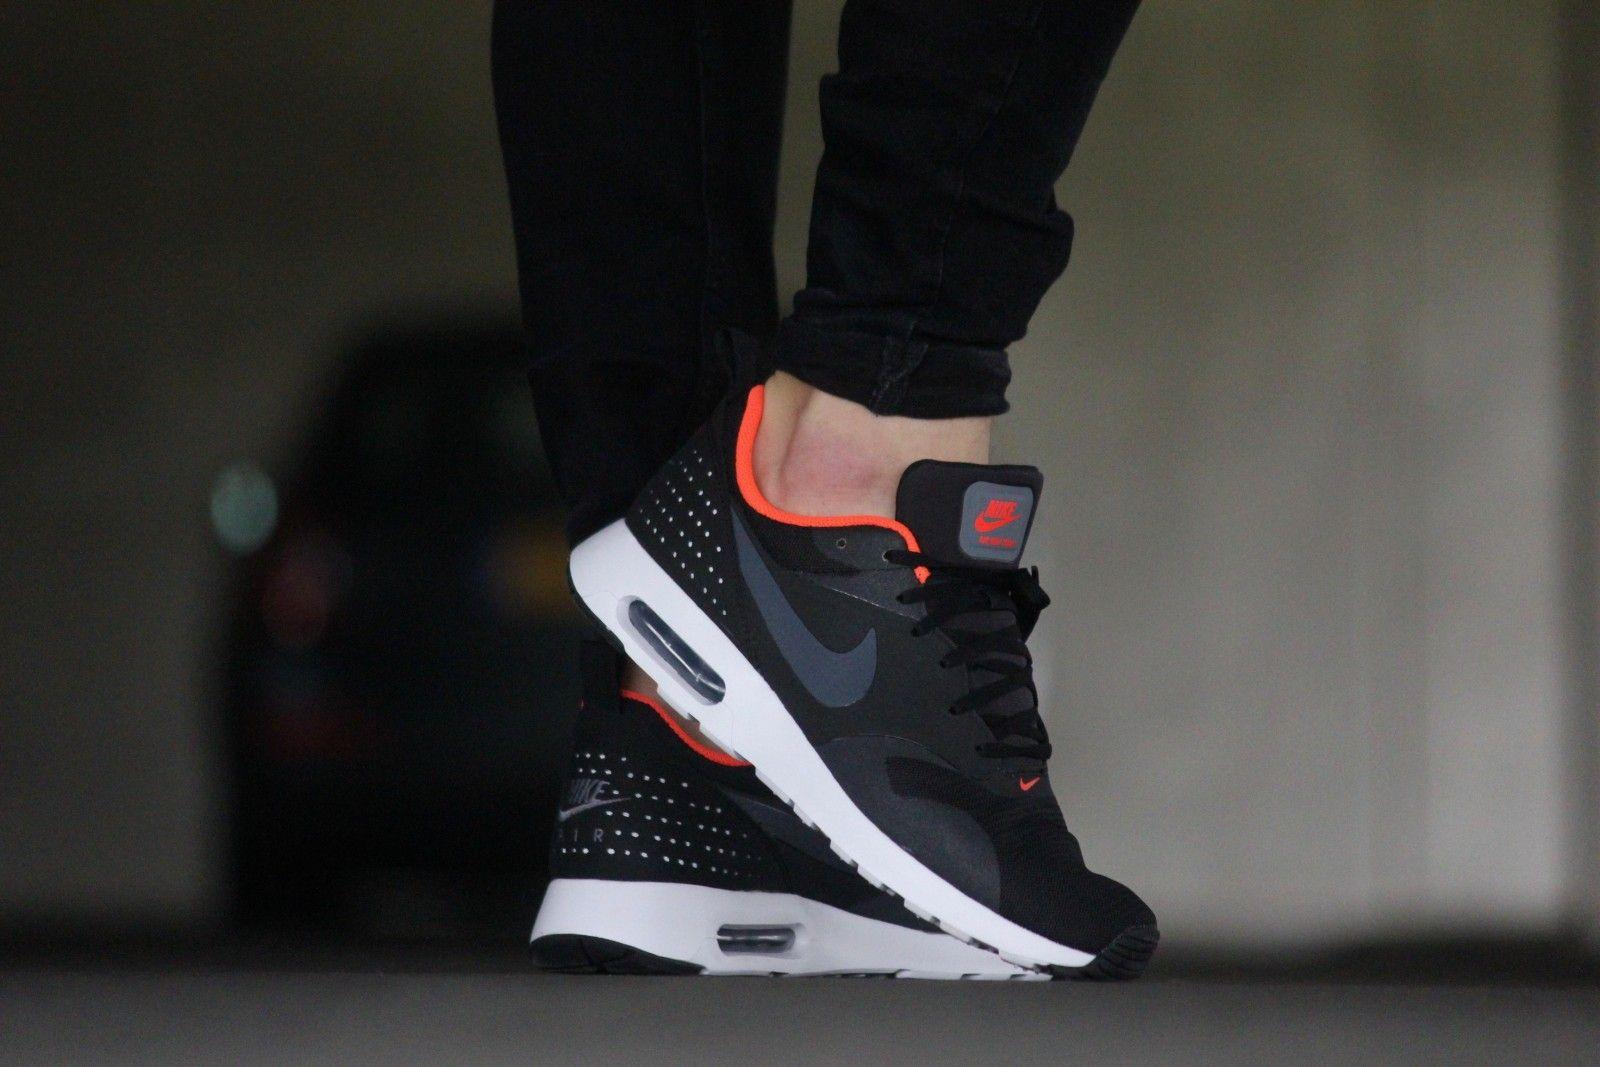 eac4cfdcdb Nike Air Max Tavas Black Dark Grey/ Crimson - 705149-008 | >>>NIKE ...